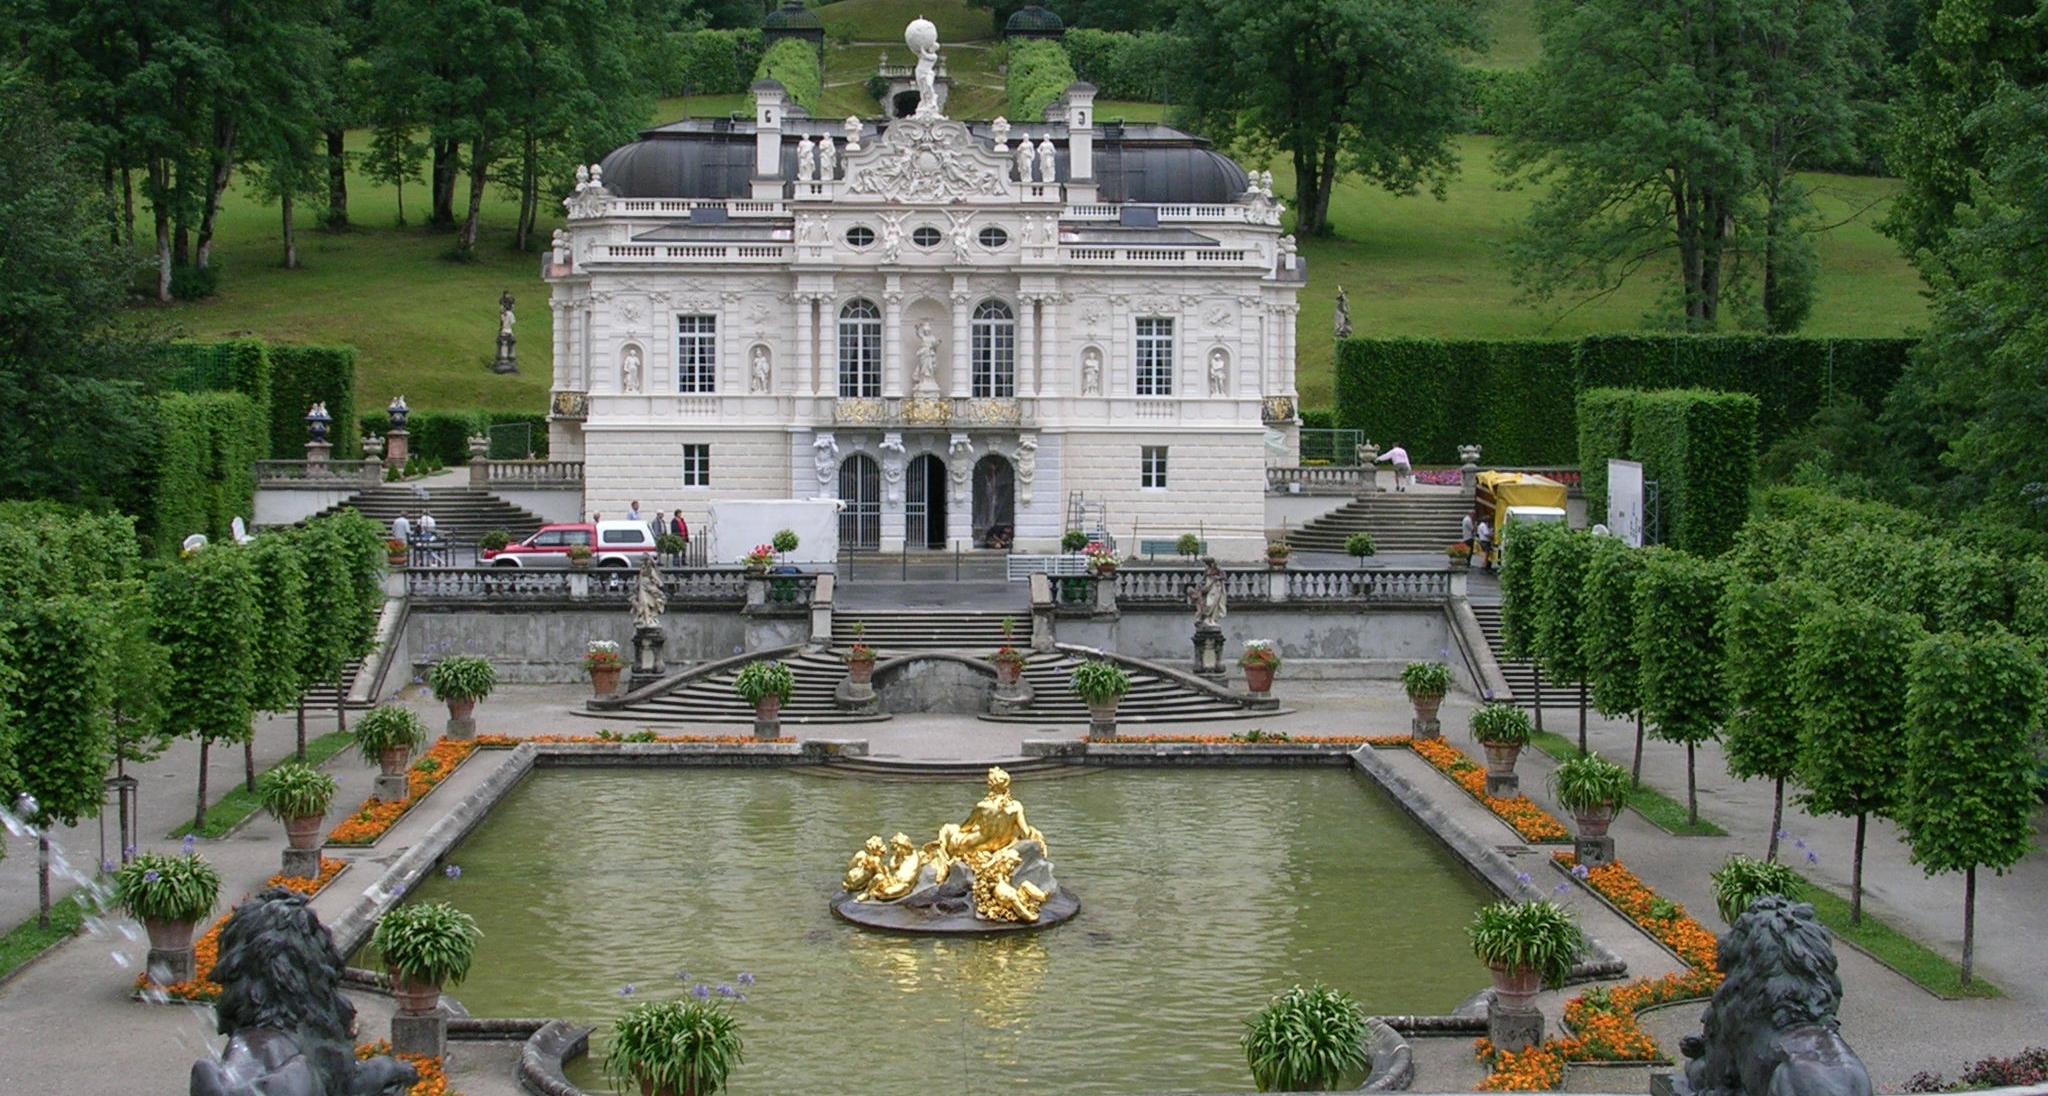 linderhof-castle-bavaria.jpg